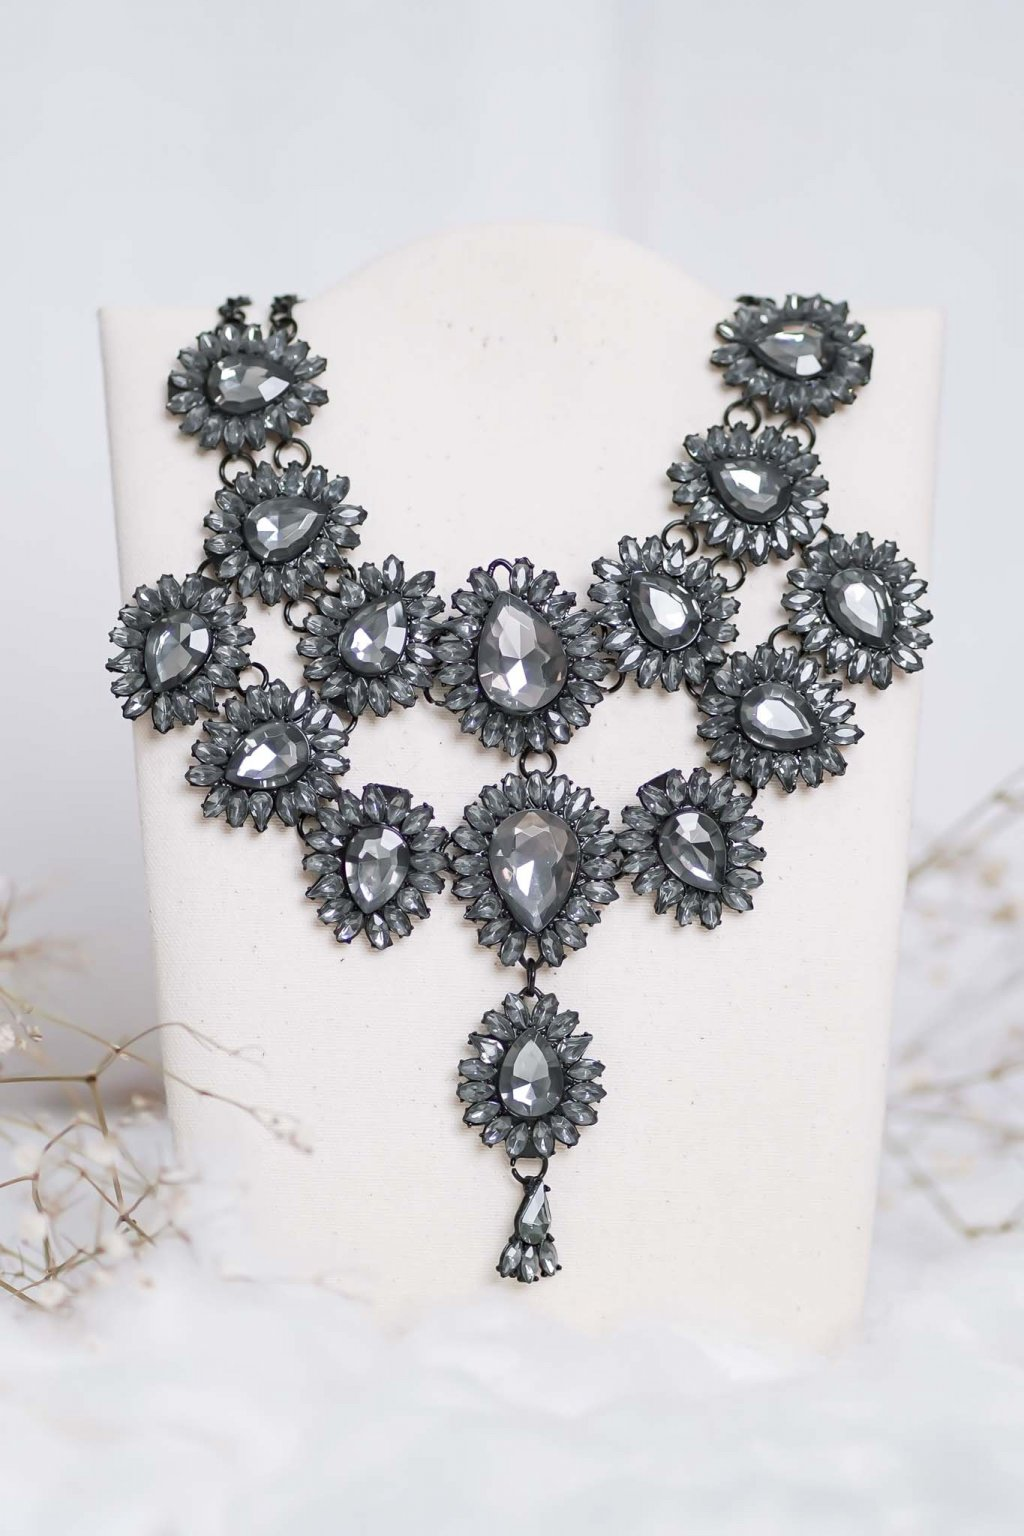 náhrdelník, šperk, spoločenská náhrdelník, náhrdelník na bežný deň, výrazný náhrdelník, jemný náhrdelník, šperky, náhrdelník na ples, svadbu, stužkovú 86